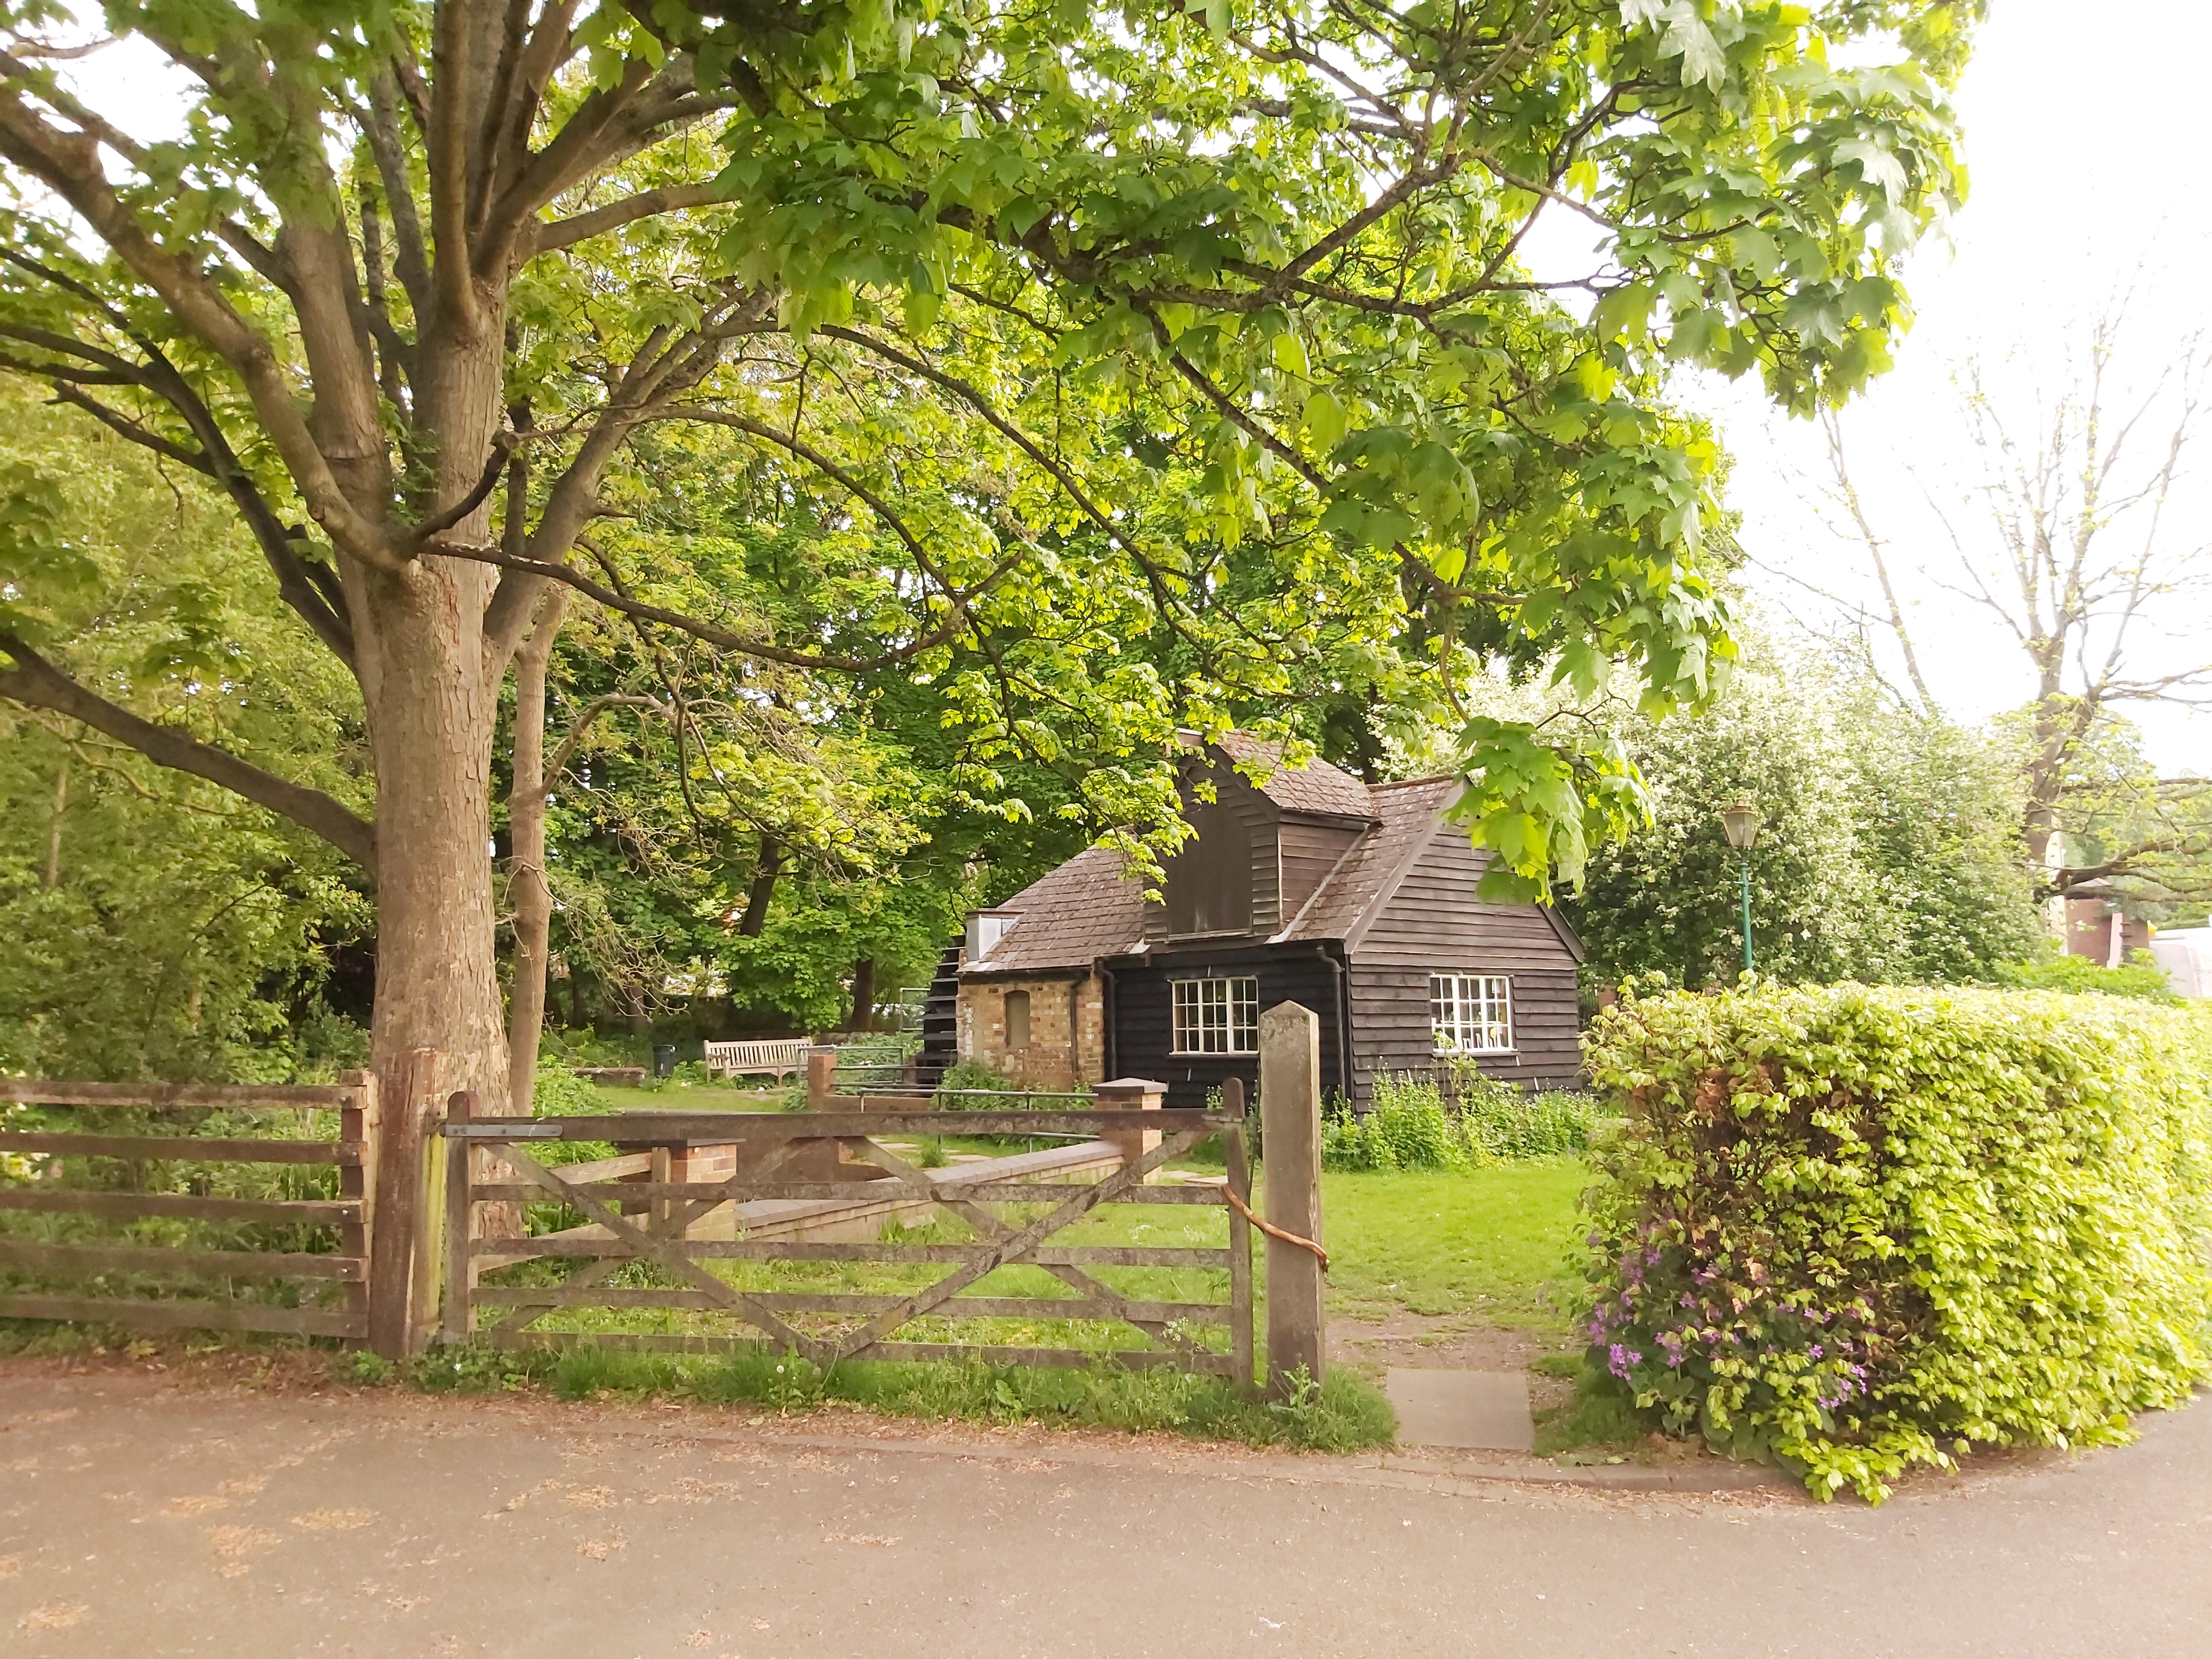 Pann Mill High Wycombe